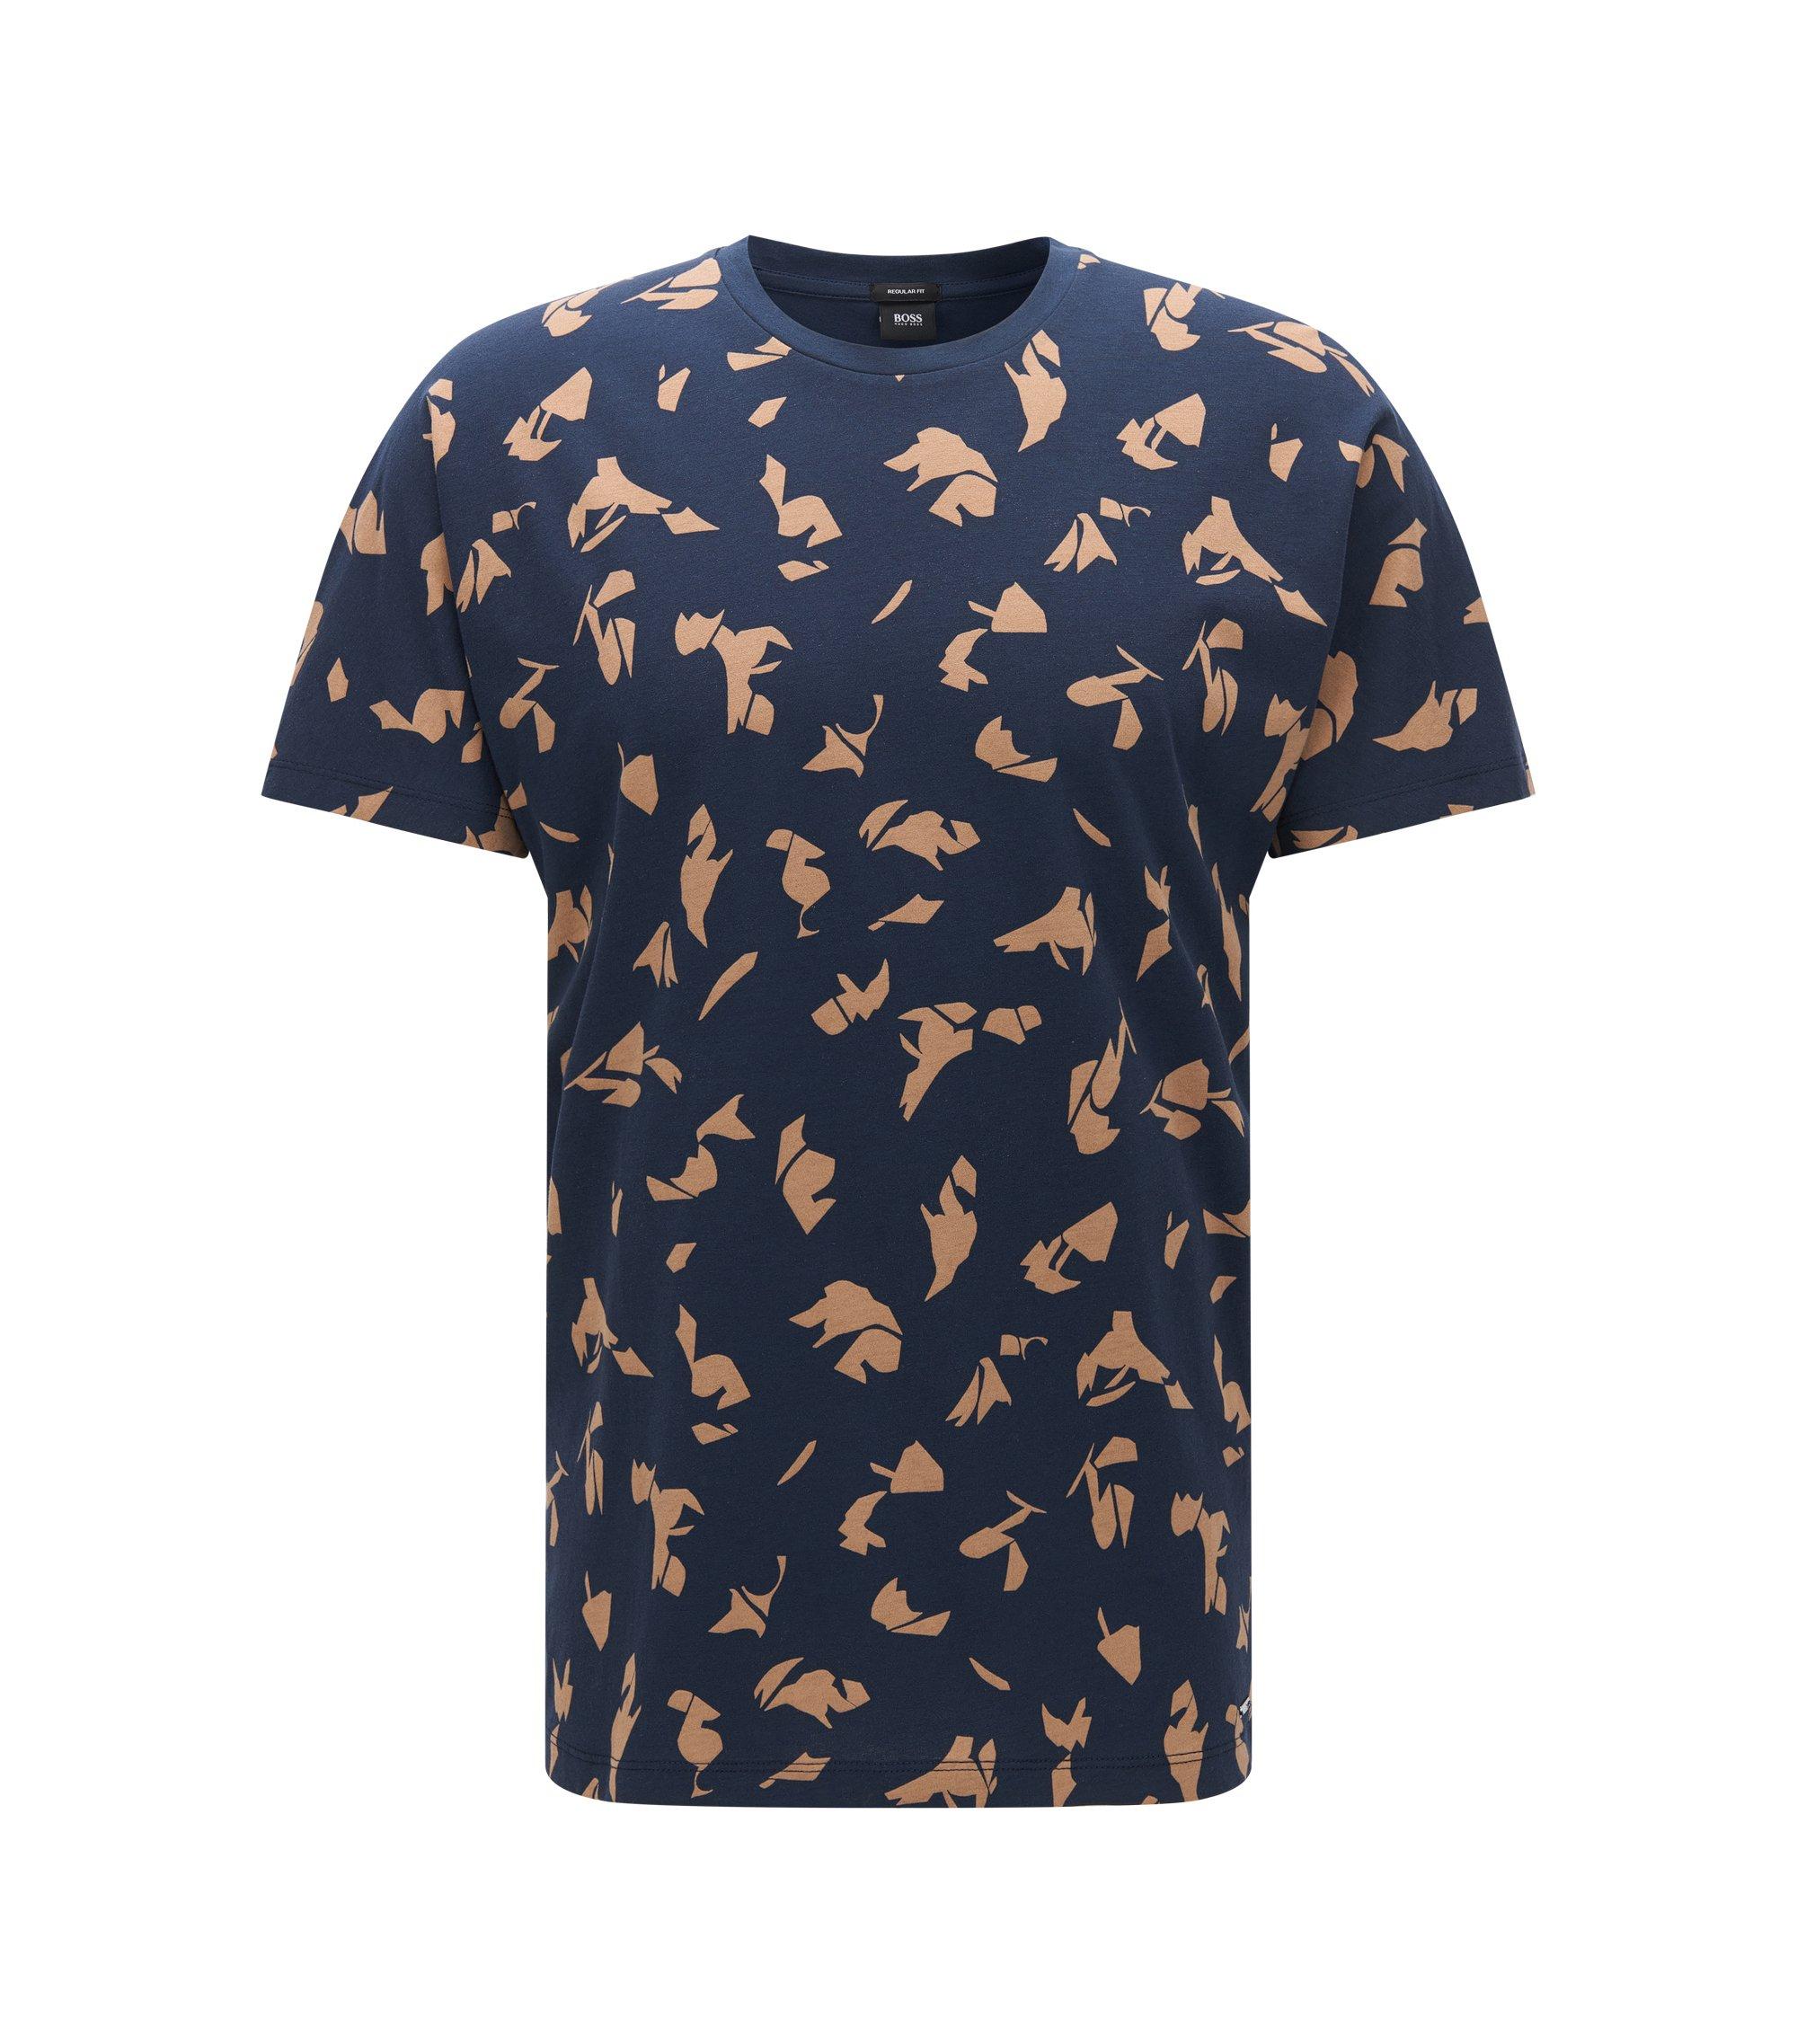 Patterned Cotton T-Shirt | Tiburt, Dark Blue